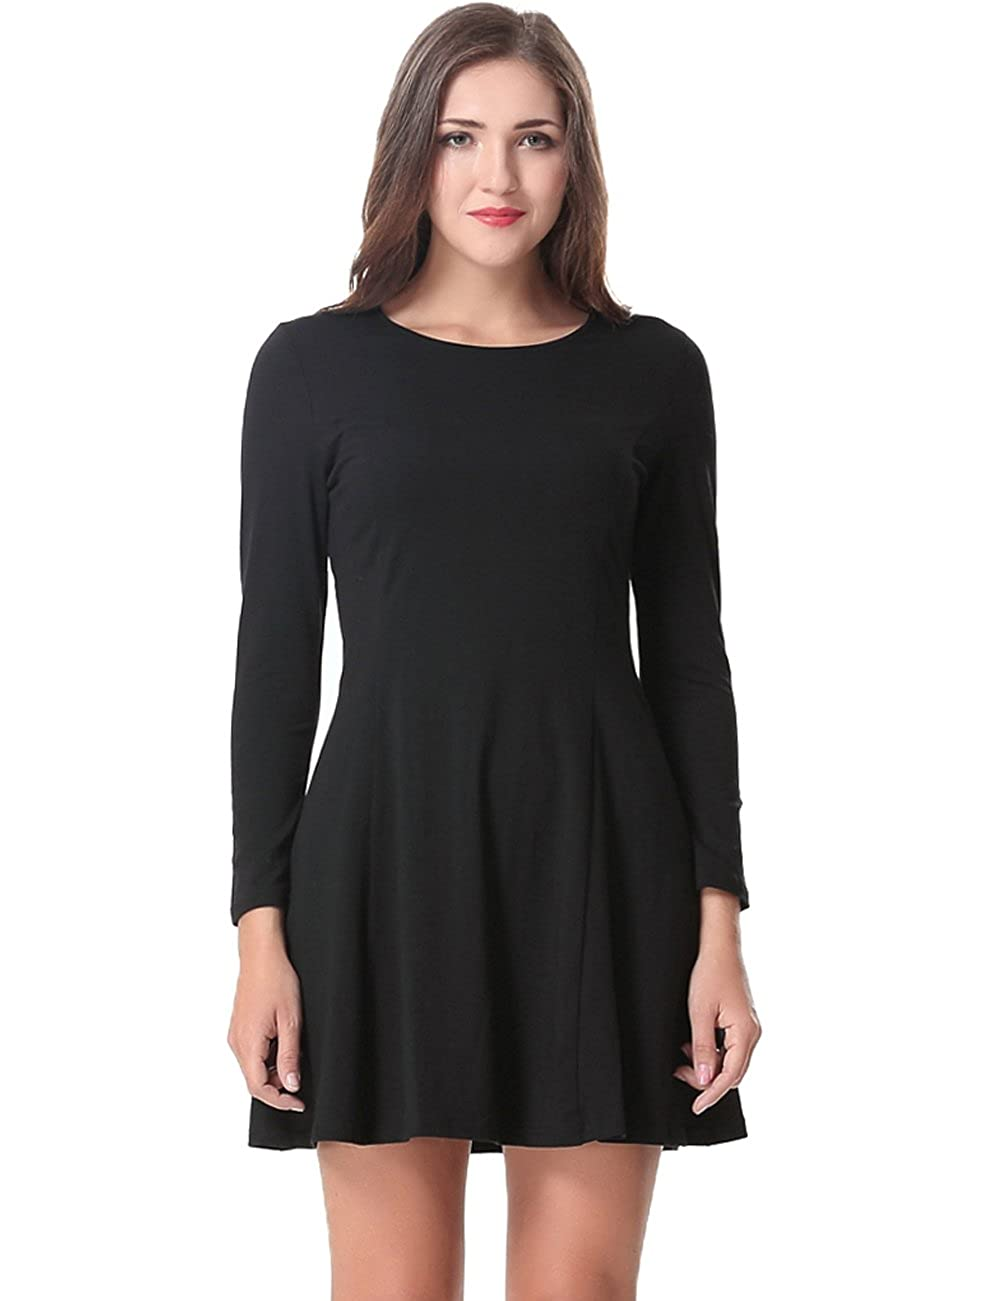 f9b3ce9470b4 Top 10 wholesale Dark Pink Skater Dress - Chinabrands.com